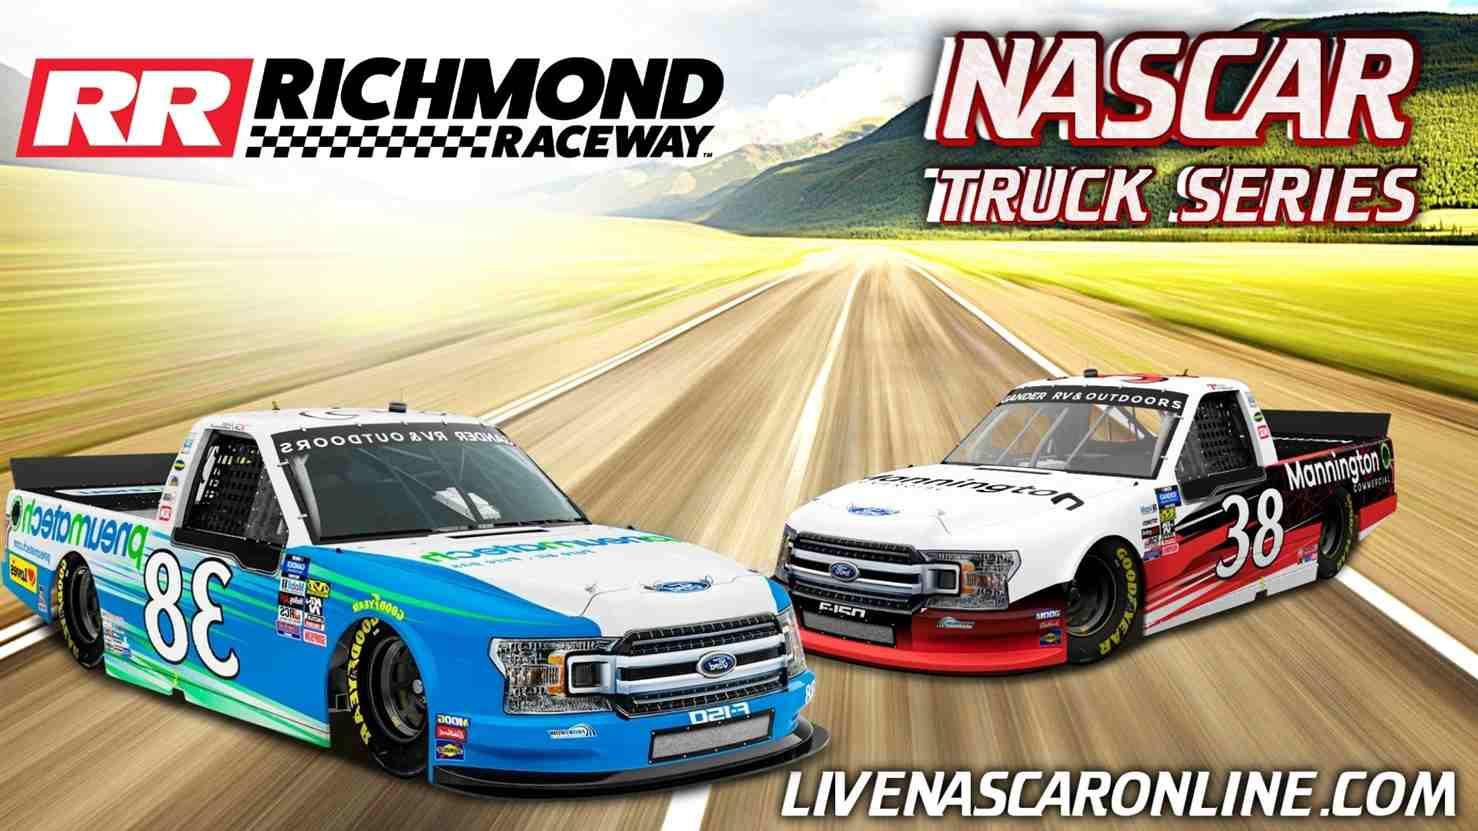 NASCAR Truck Series at Richmond Live Stream